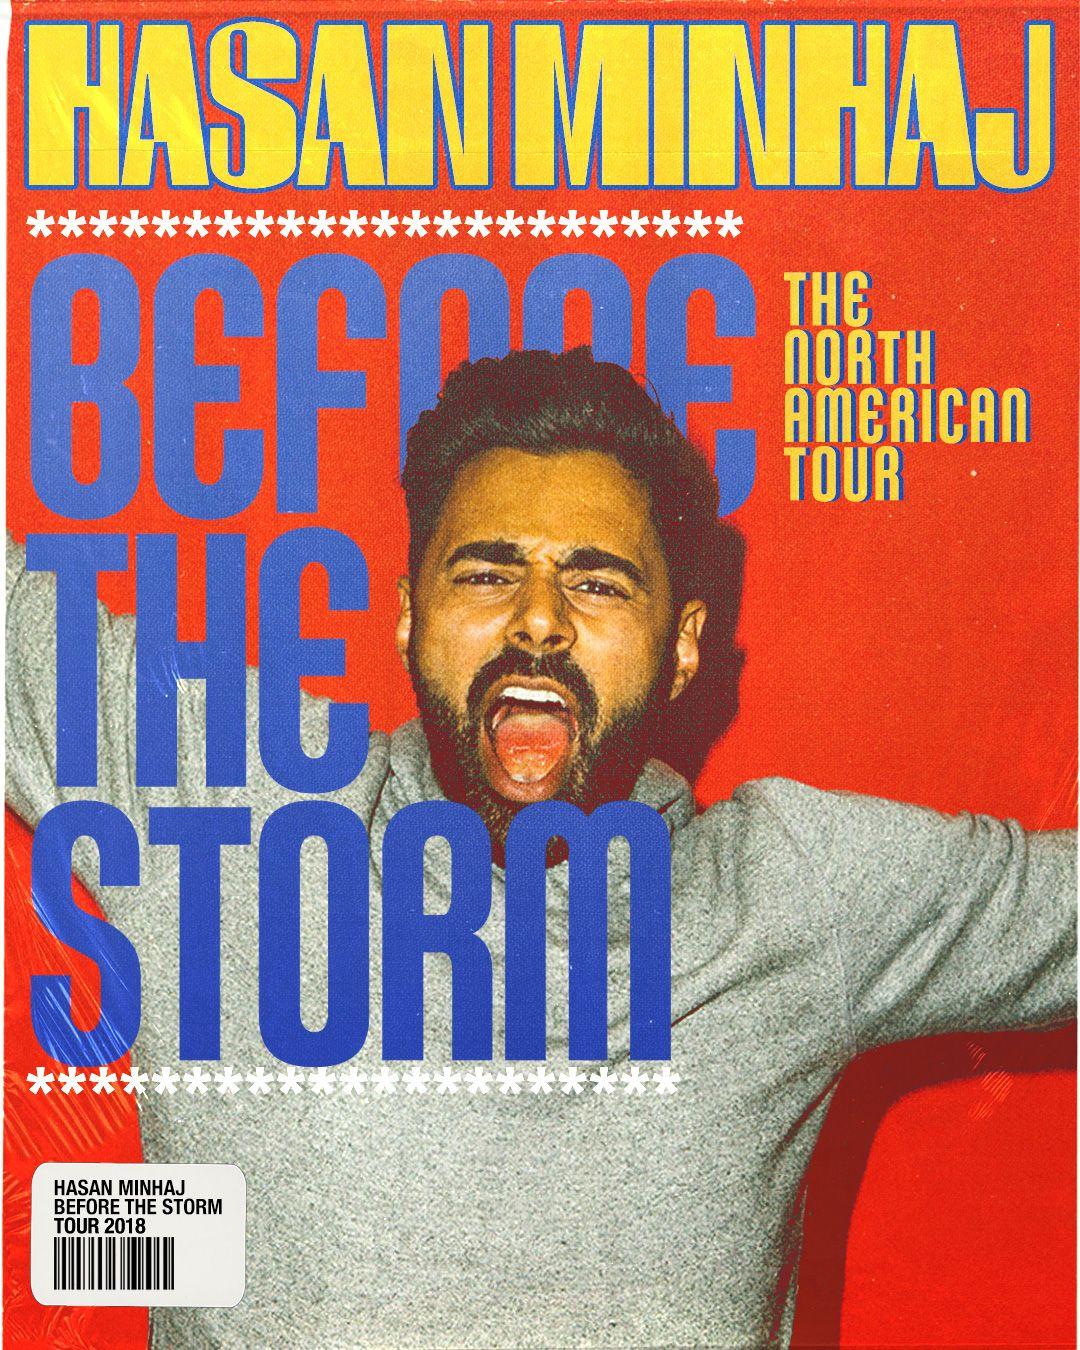 Hasan Minhaj: Before The Storm